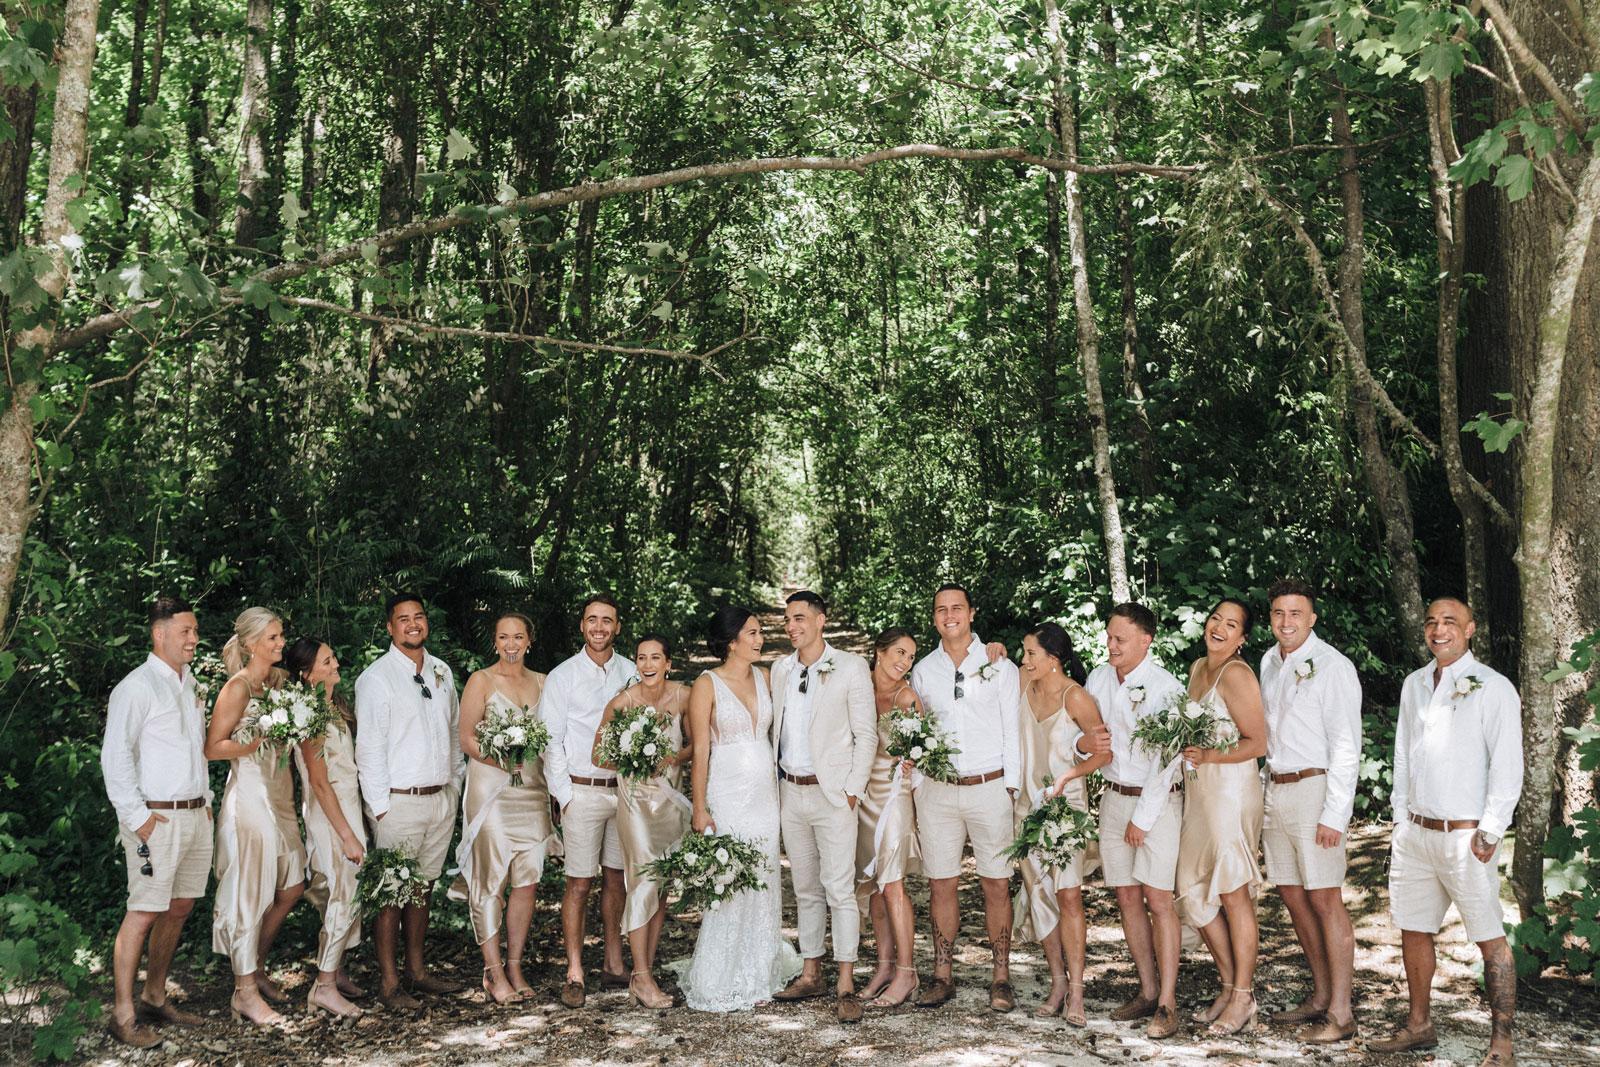 newfound-n-w-black-barn-tarawera-rotorua-wedding-photographer-285